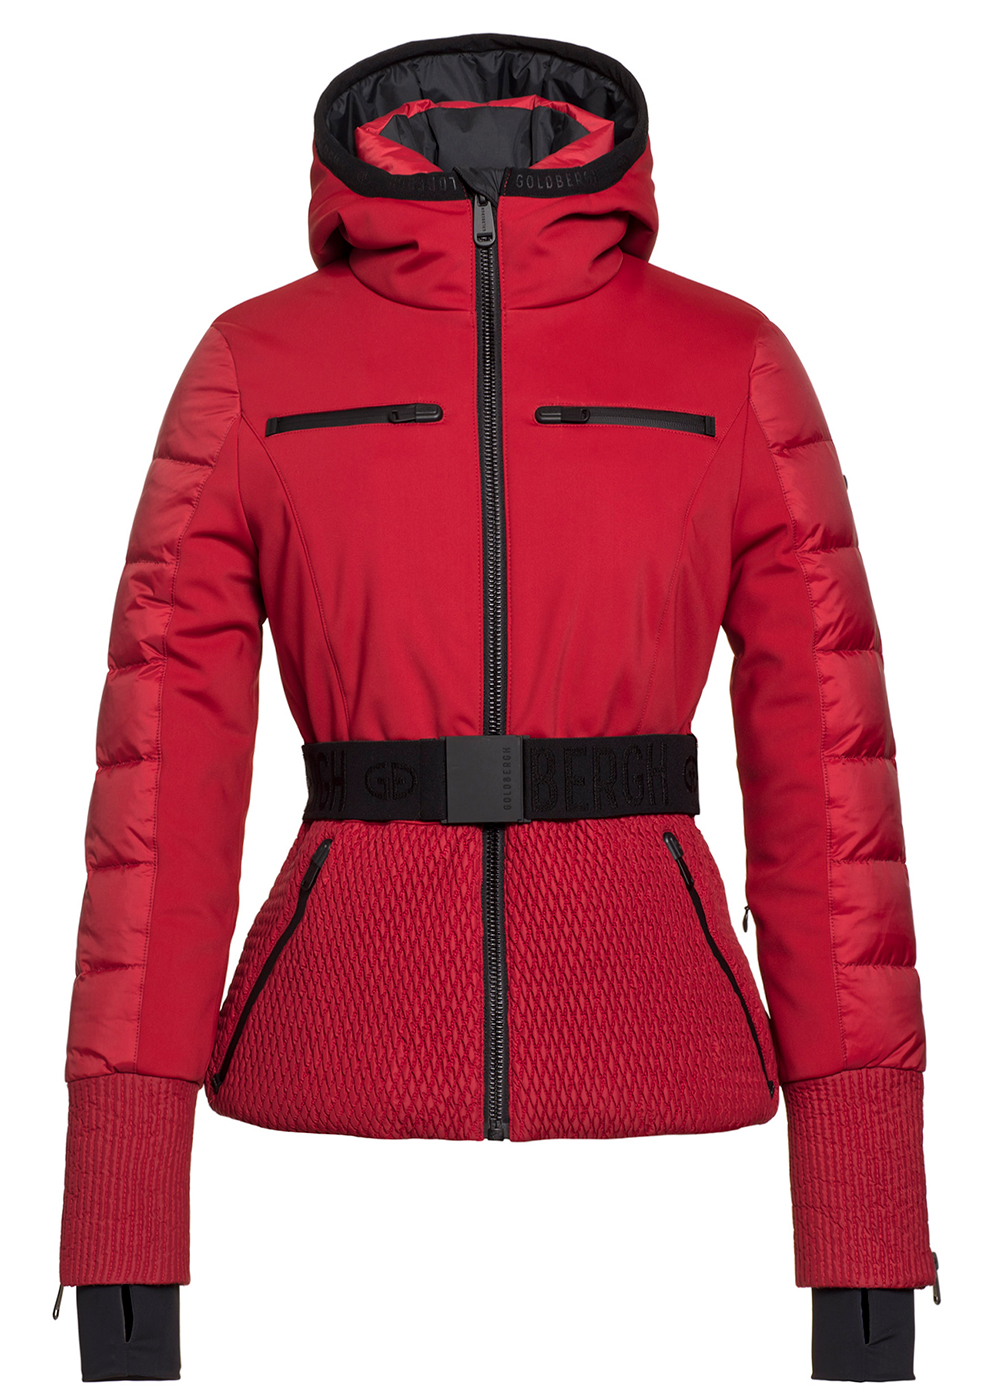 Stylish Red Ski Jacket by Goldbergh